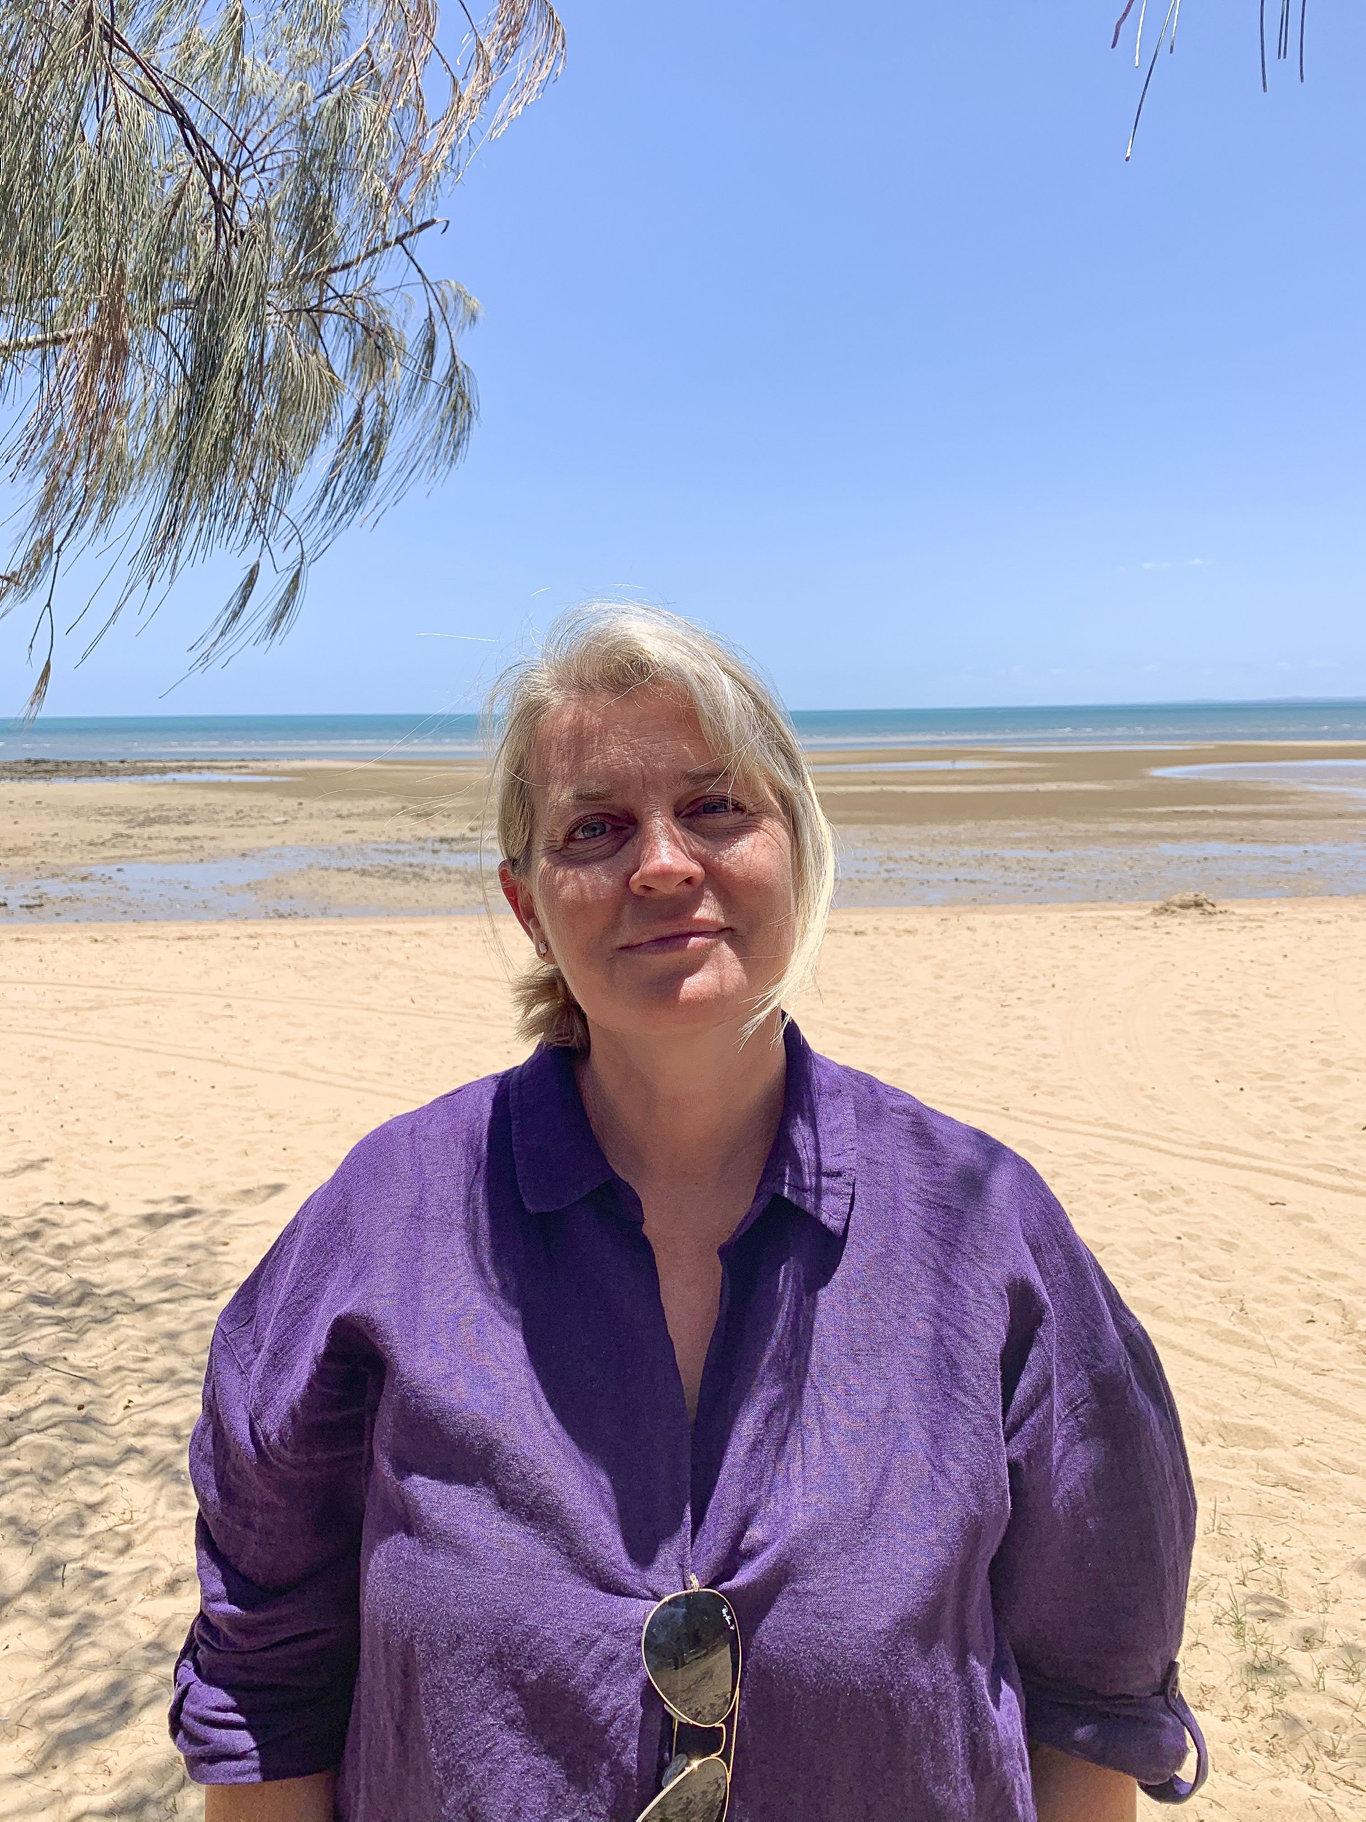 Karla Reardon, council candidate